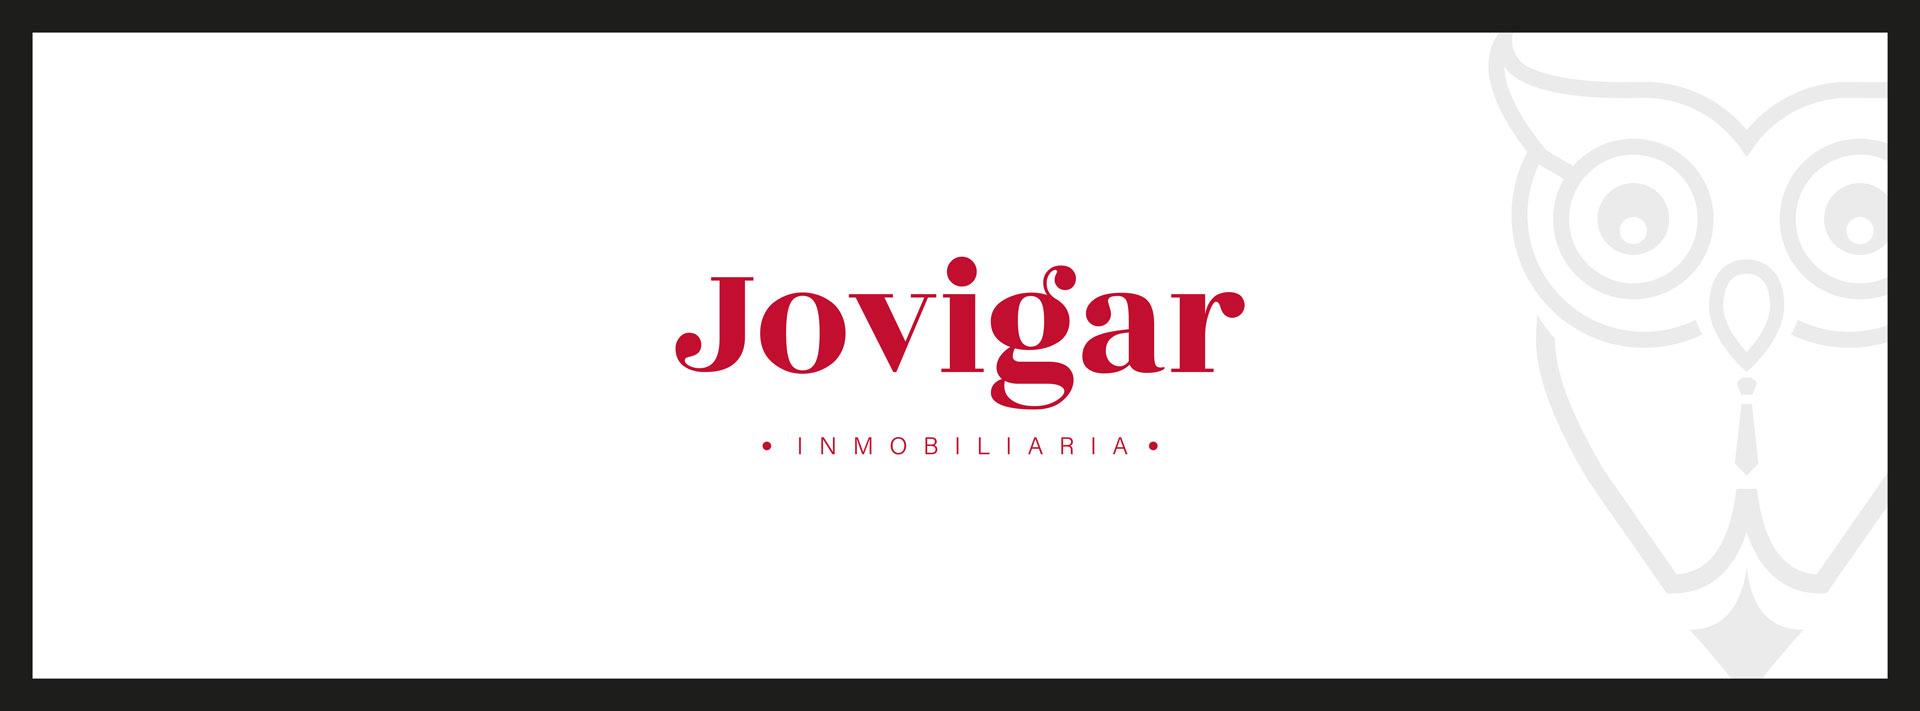 CABECER-WEB-JOVIGAR